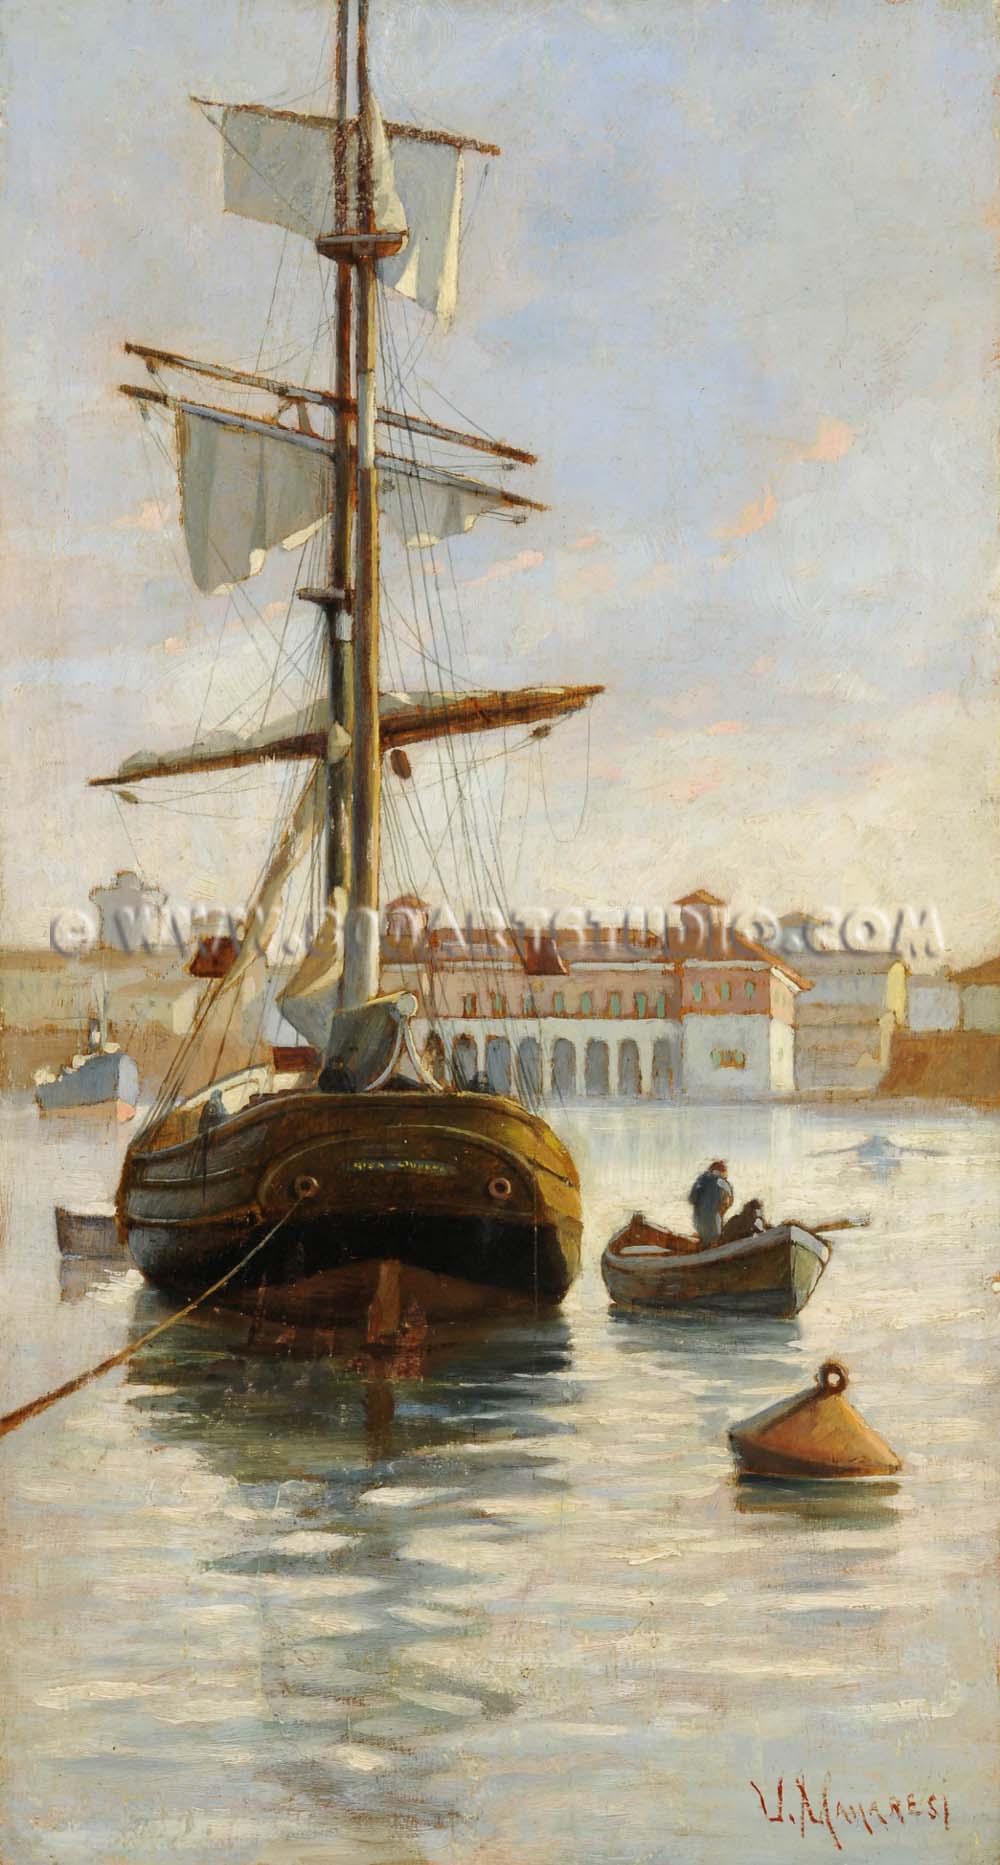 Ugo Manaresi - Veliero nel porto mediceo